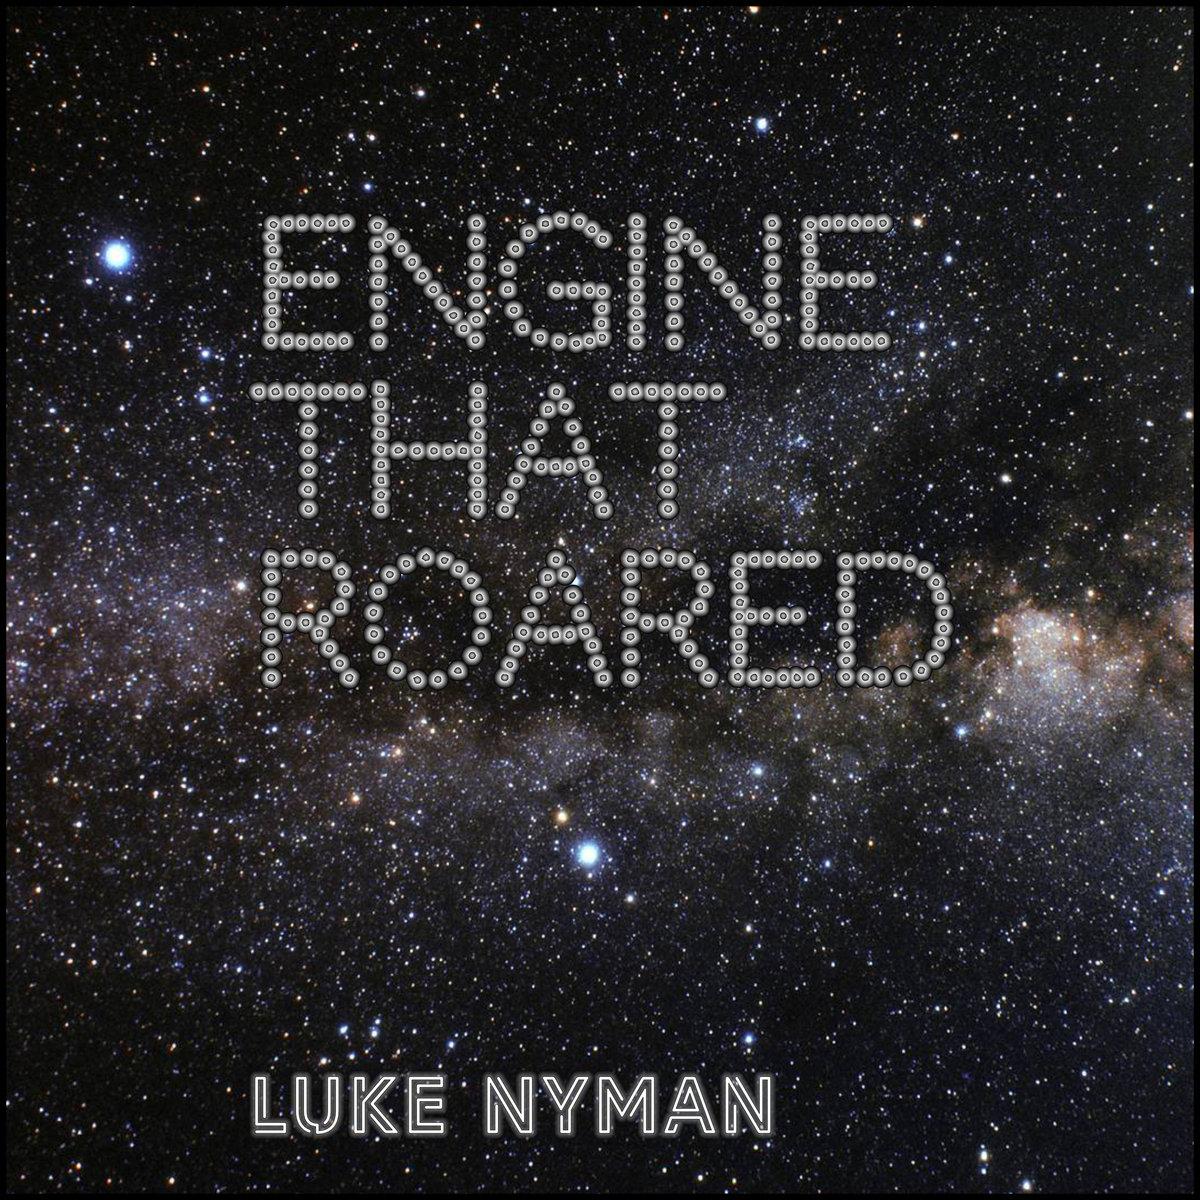 Engine That Roared by Luke Nyman